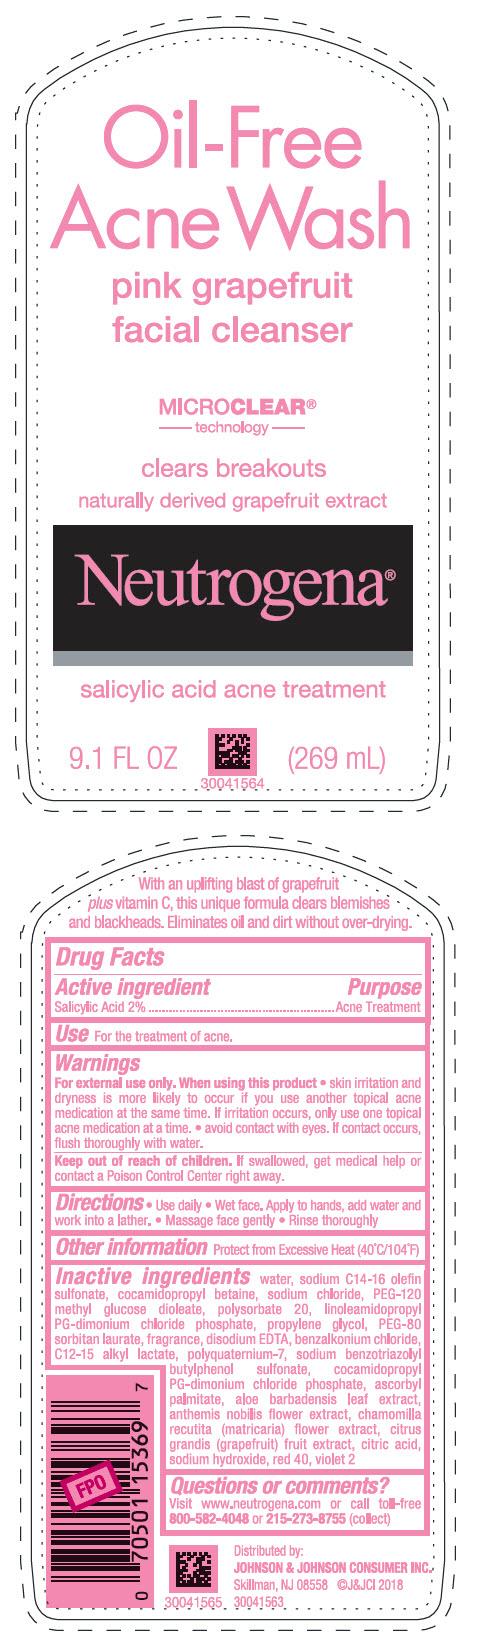 Salicylic Acid - Pink Grapefruit Facial Cleanser (Neutrogena Oil Free Acne Wash)